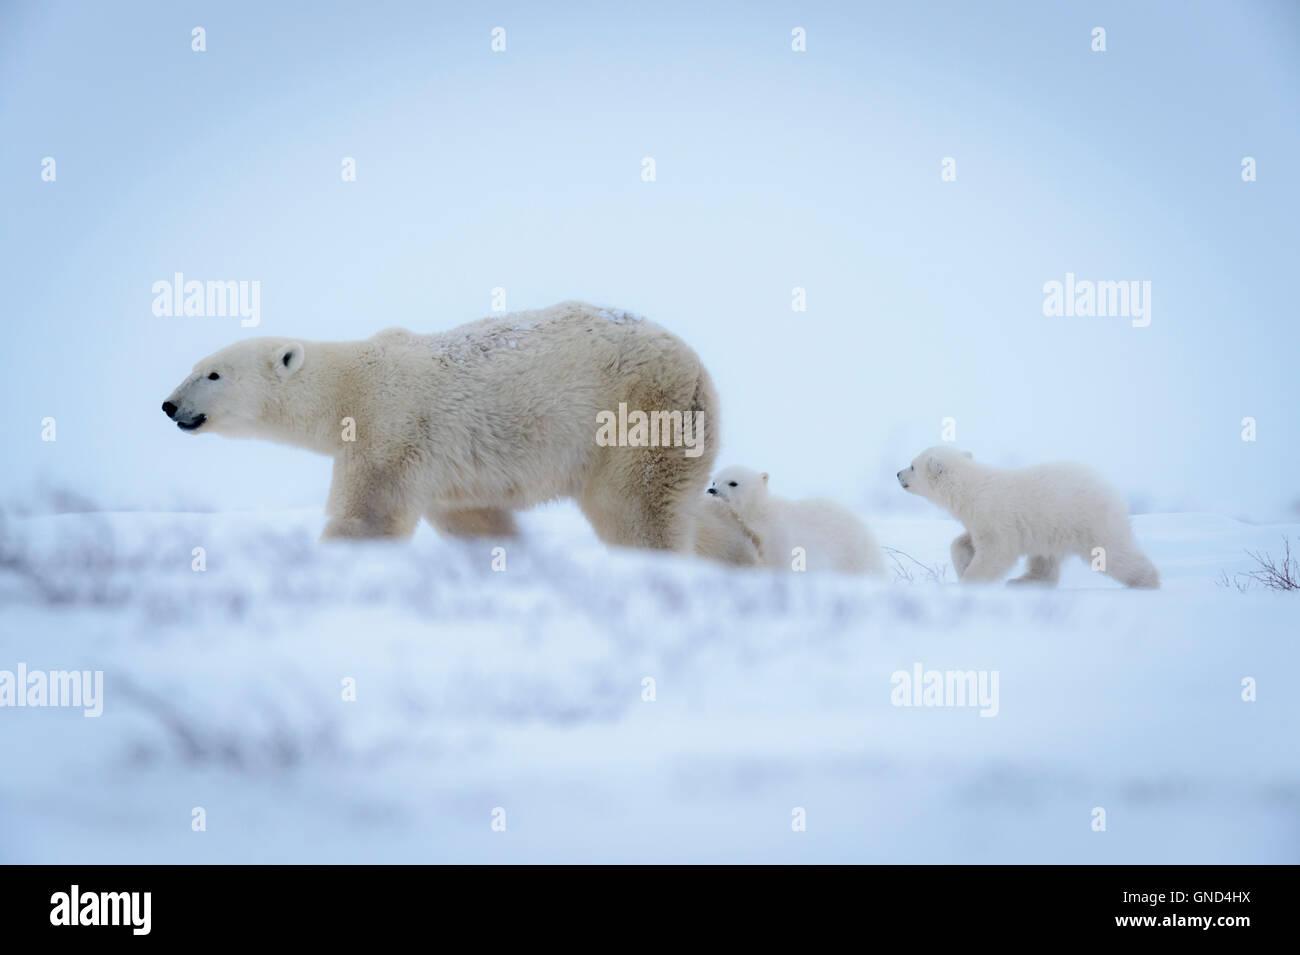 Polar bear mother (Ursus maritimus) with two cubs walking on tundra at dusk, Wapusk National Park, Manitoba, Canada - Stock Image